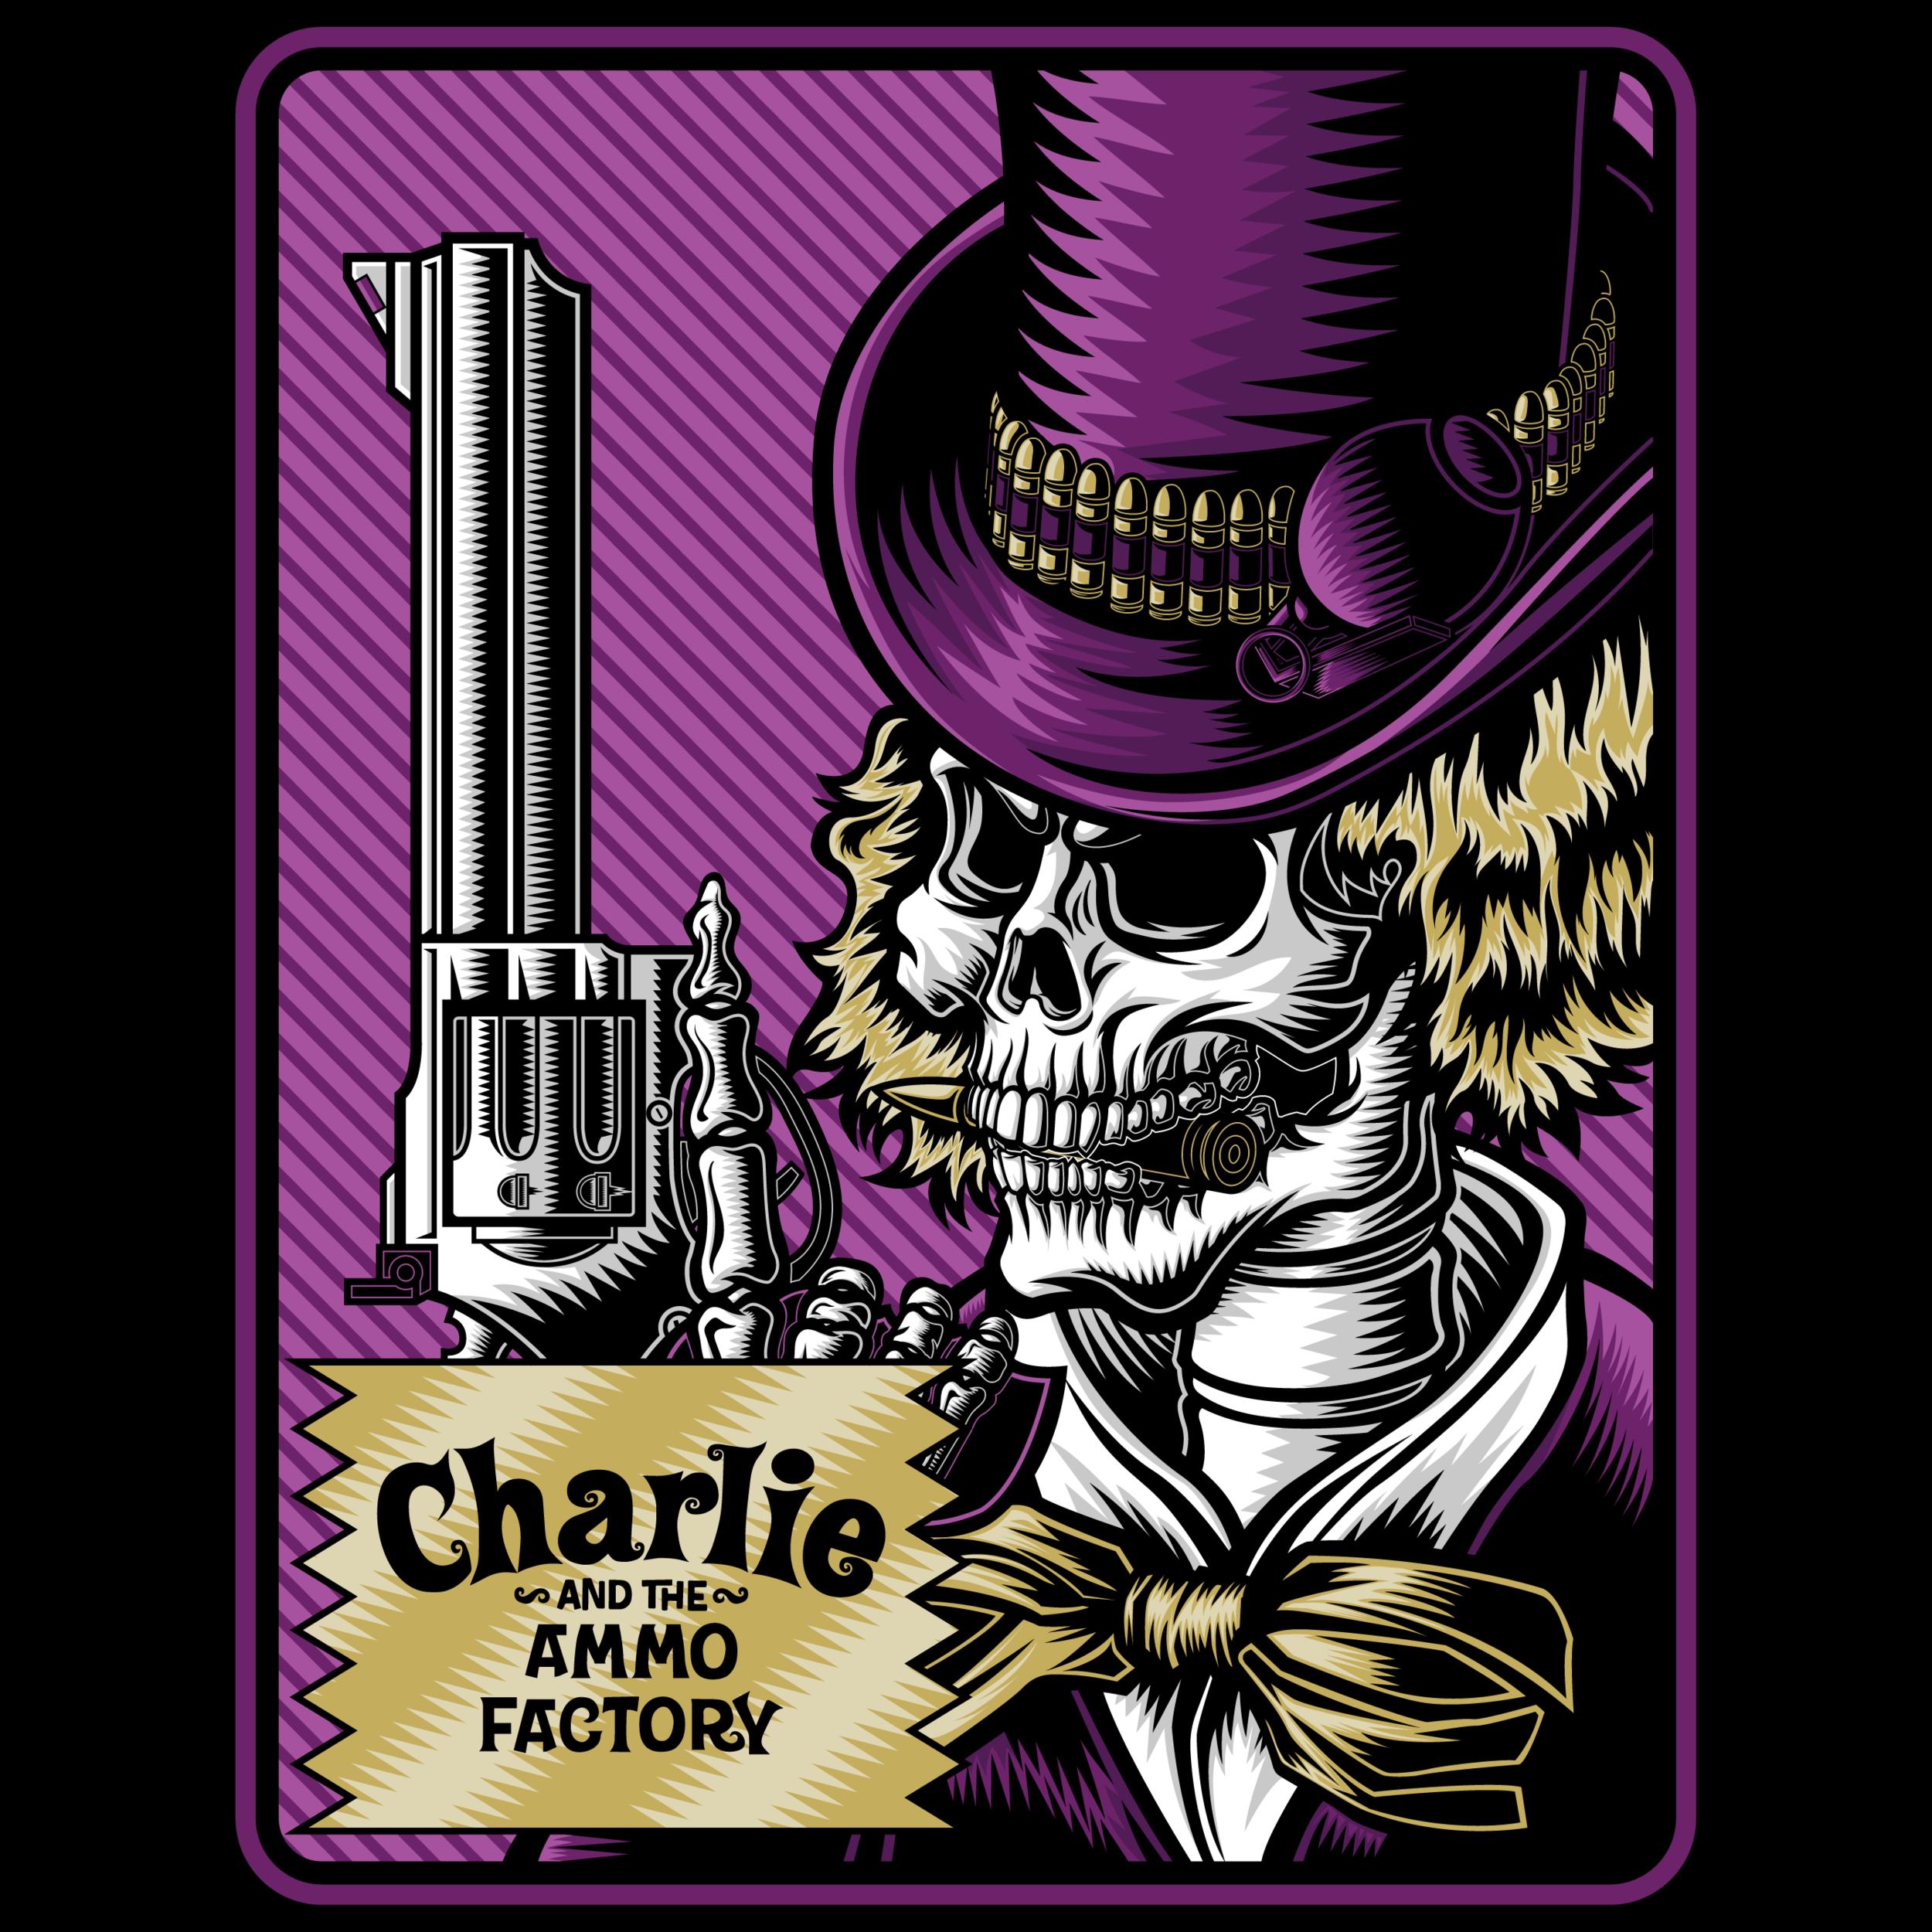 defcon-propaganda-charlie-and-the-ammo-factory-pencil-illustration-roberto-orozco-design-robertoorozco-orozcodesign-vector-vectorillustration-guns-patch-skull.jpg